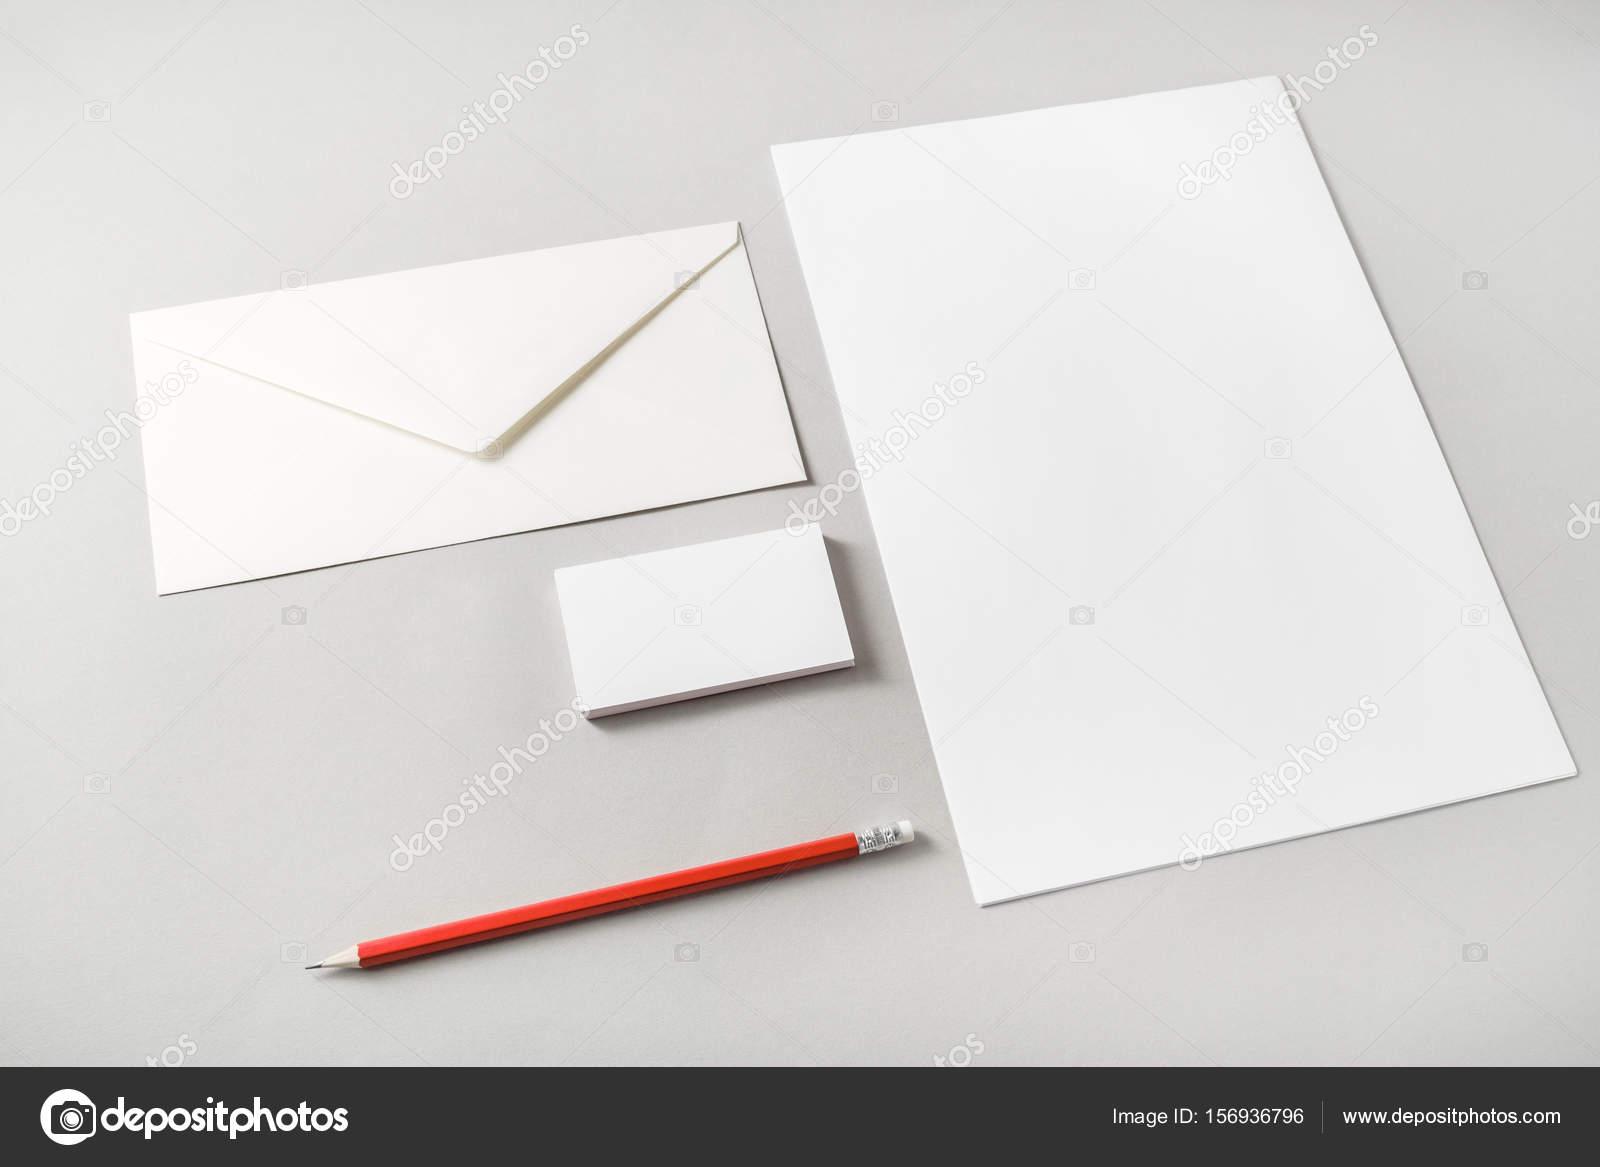 blank stationery template stock photo veresovich 156936796